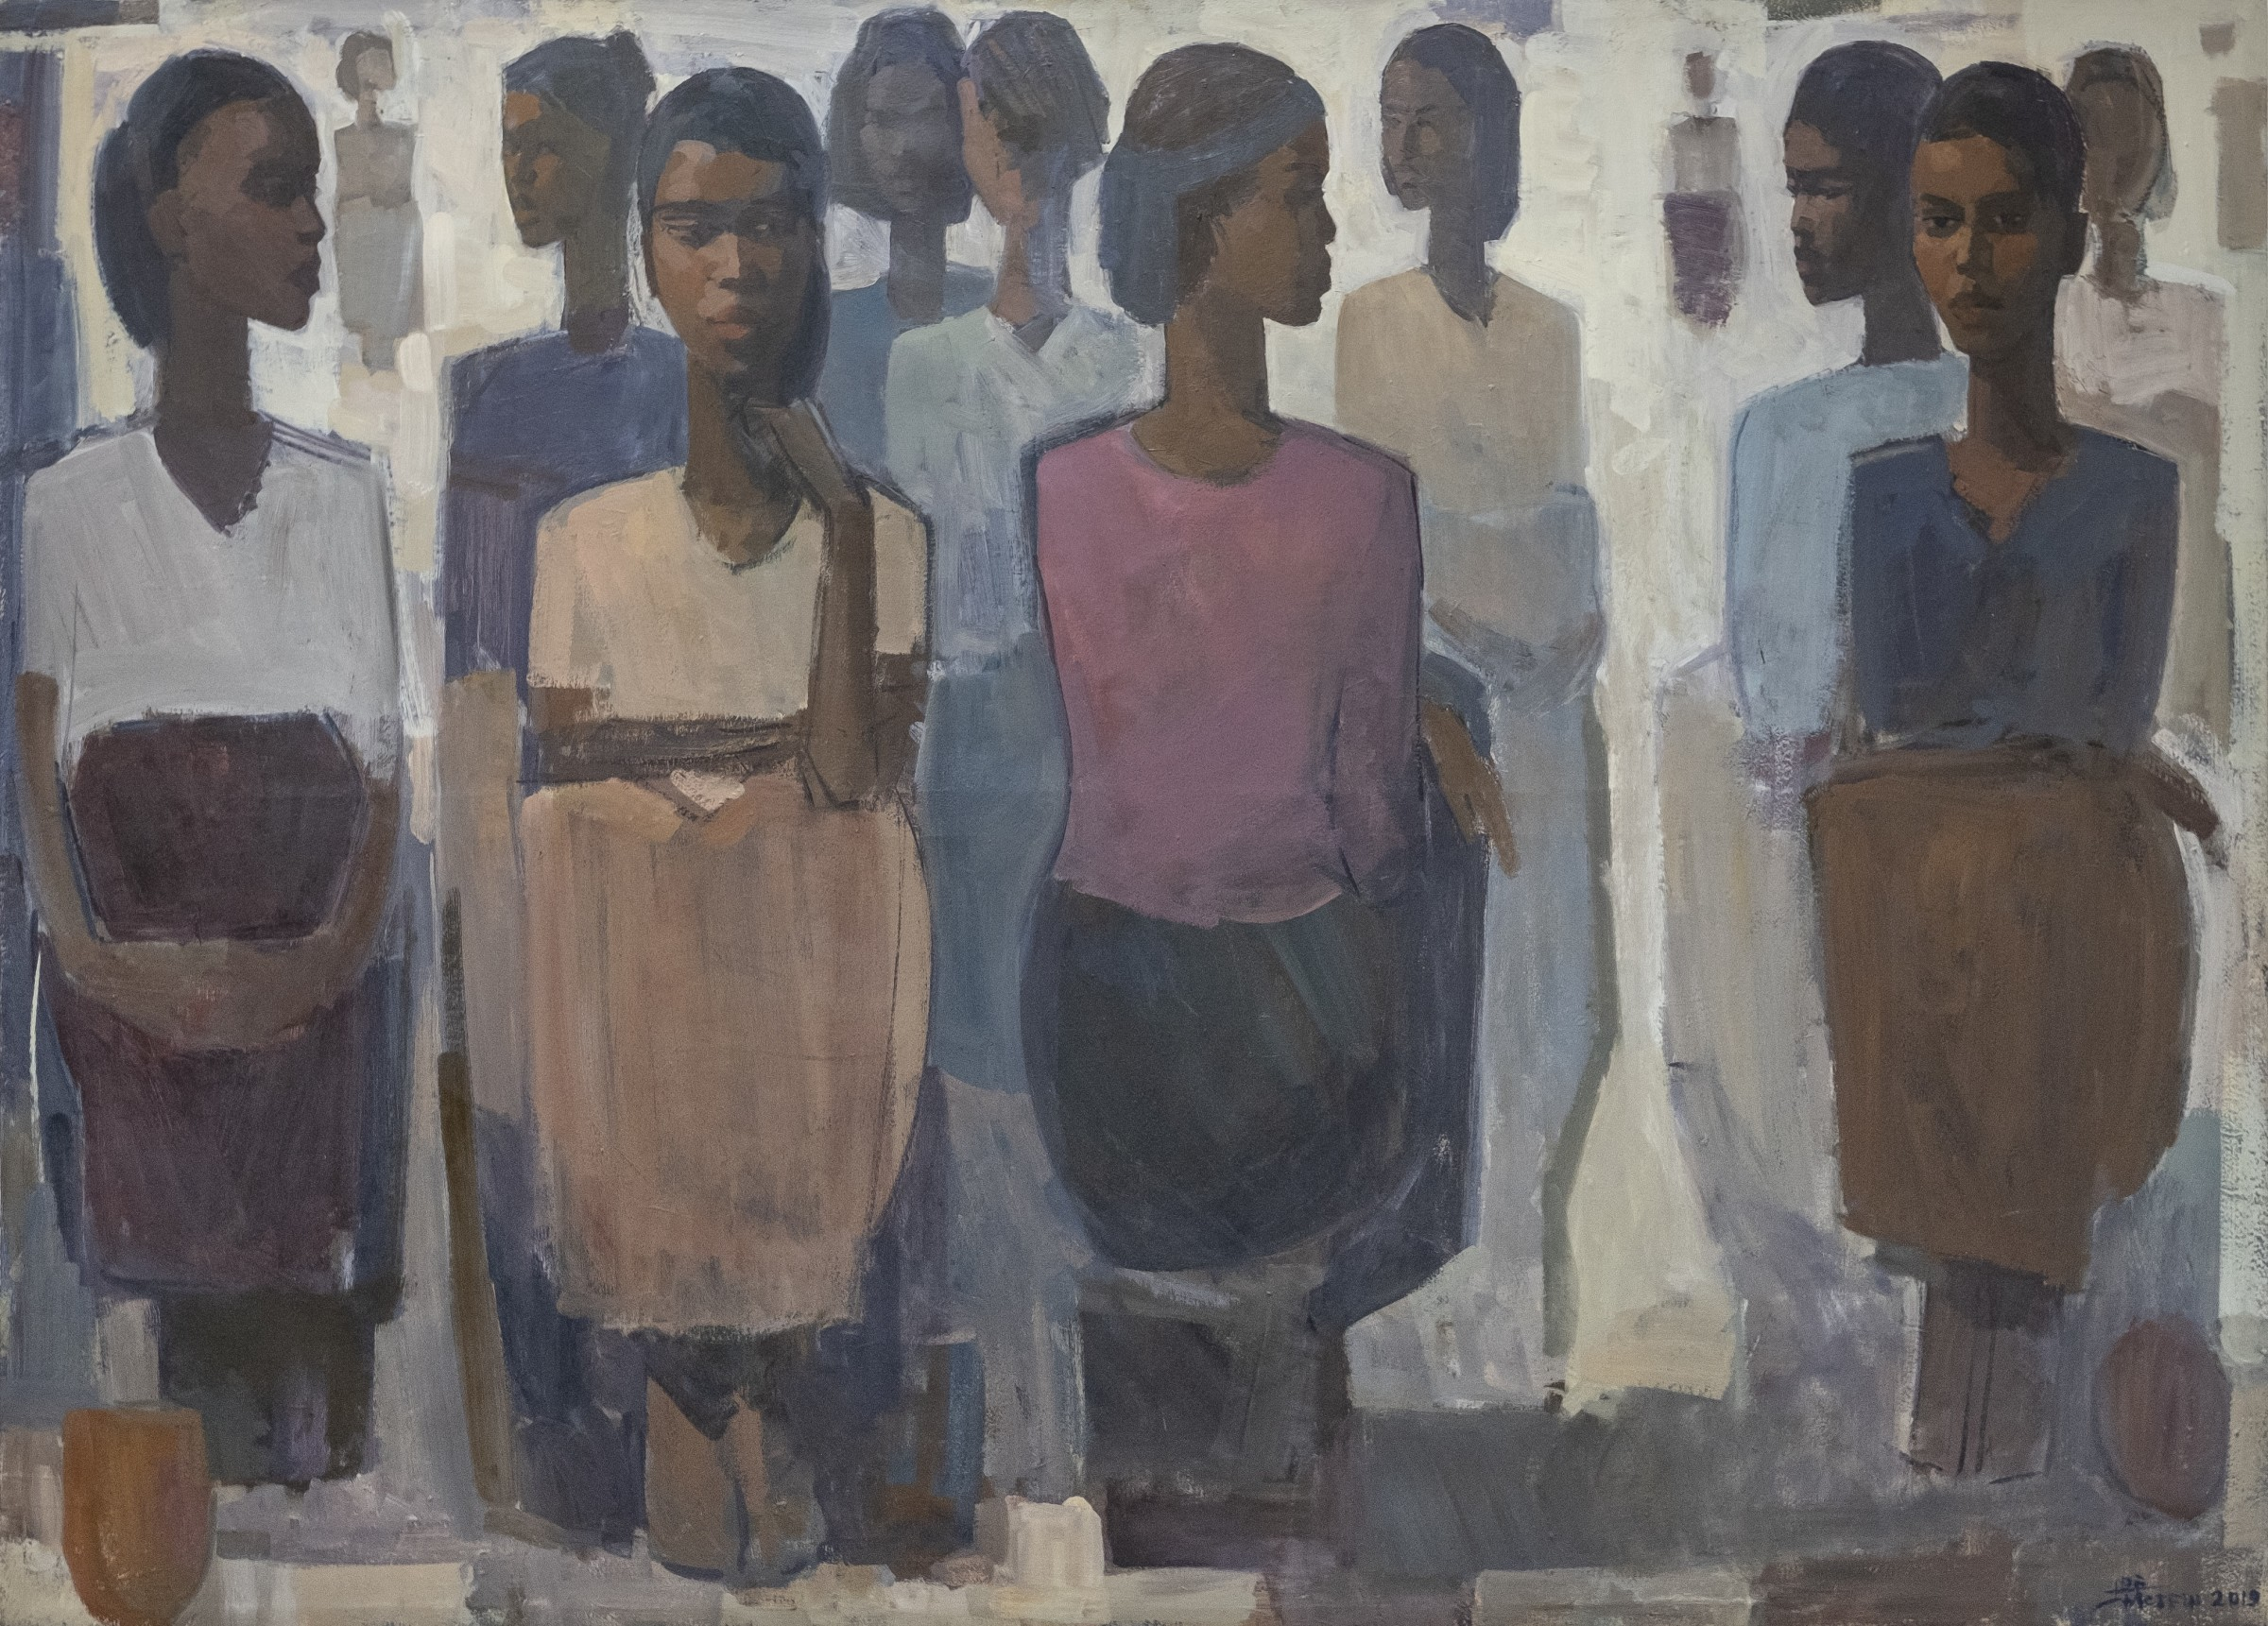 Works | Art Dubai 2019 | Booth C15 | Addis Fine Art